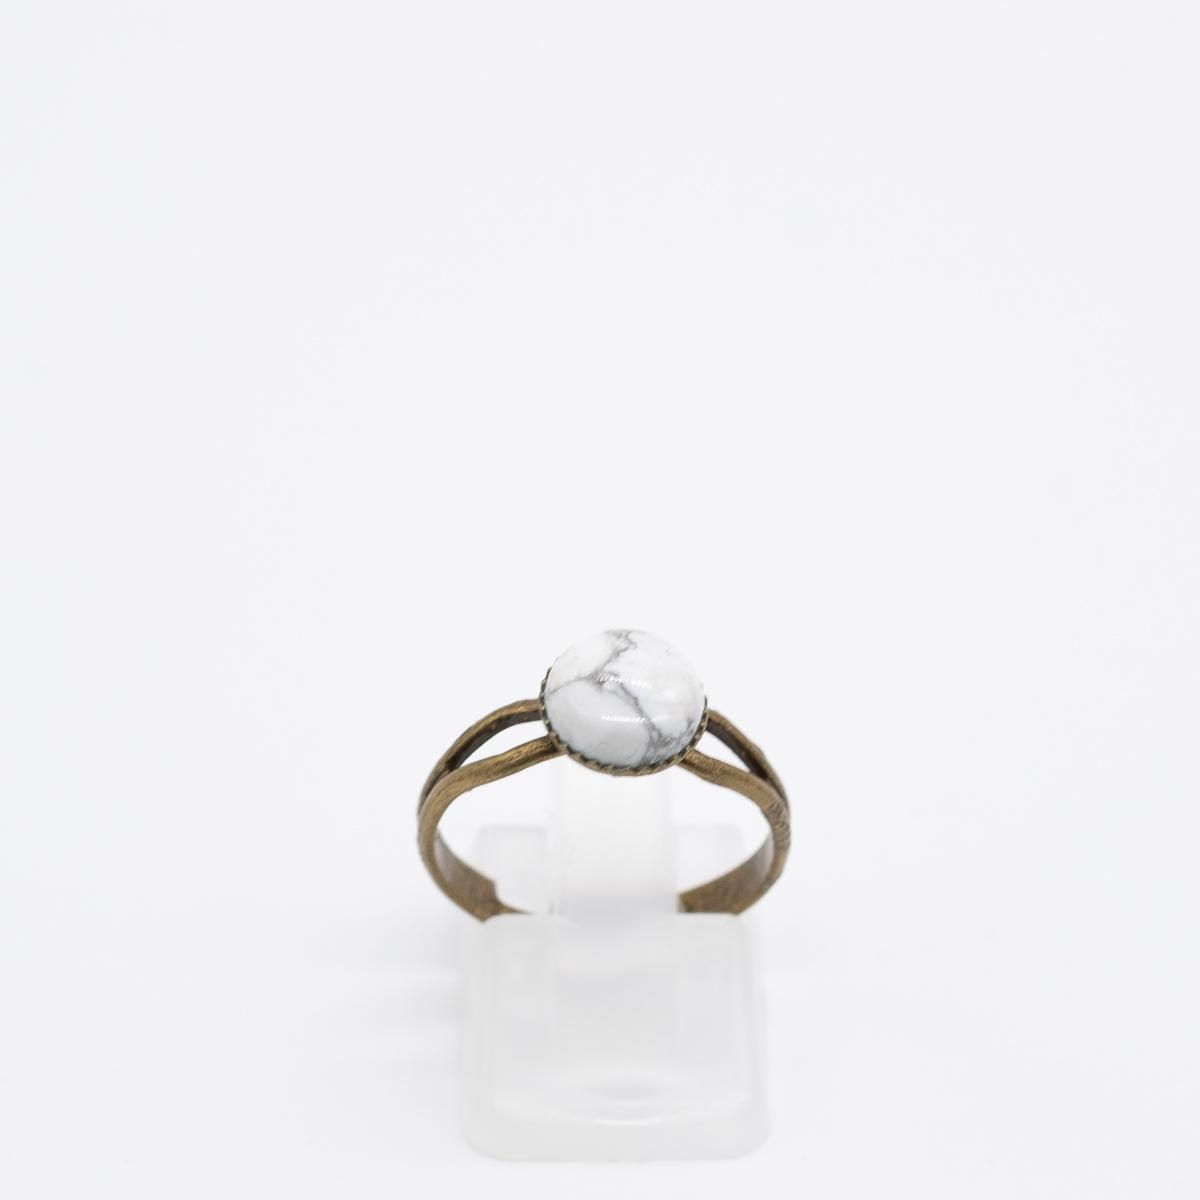 RNG-020 howliet ring brons kopen